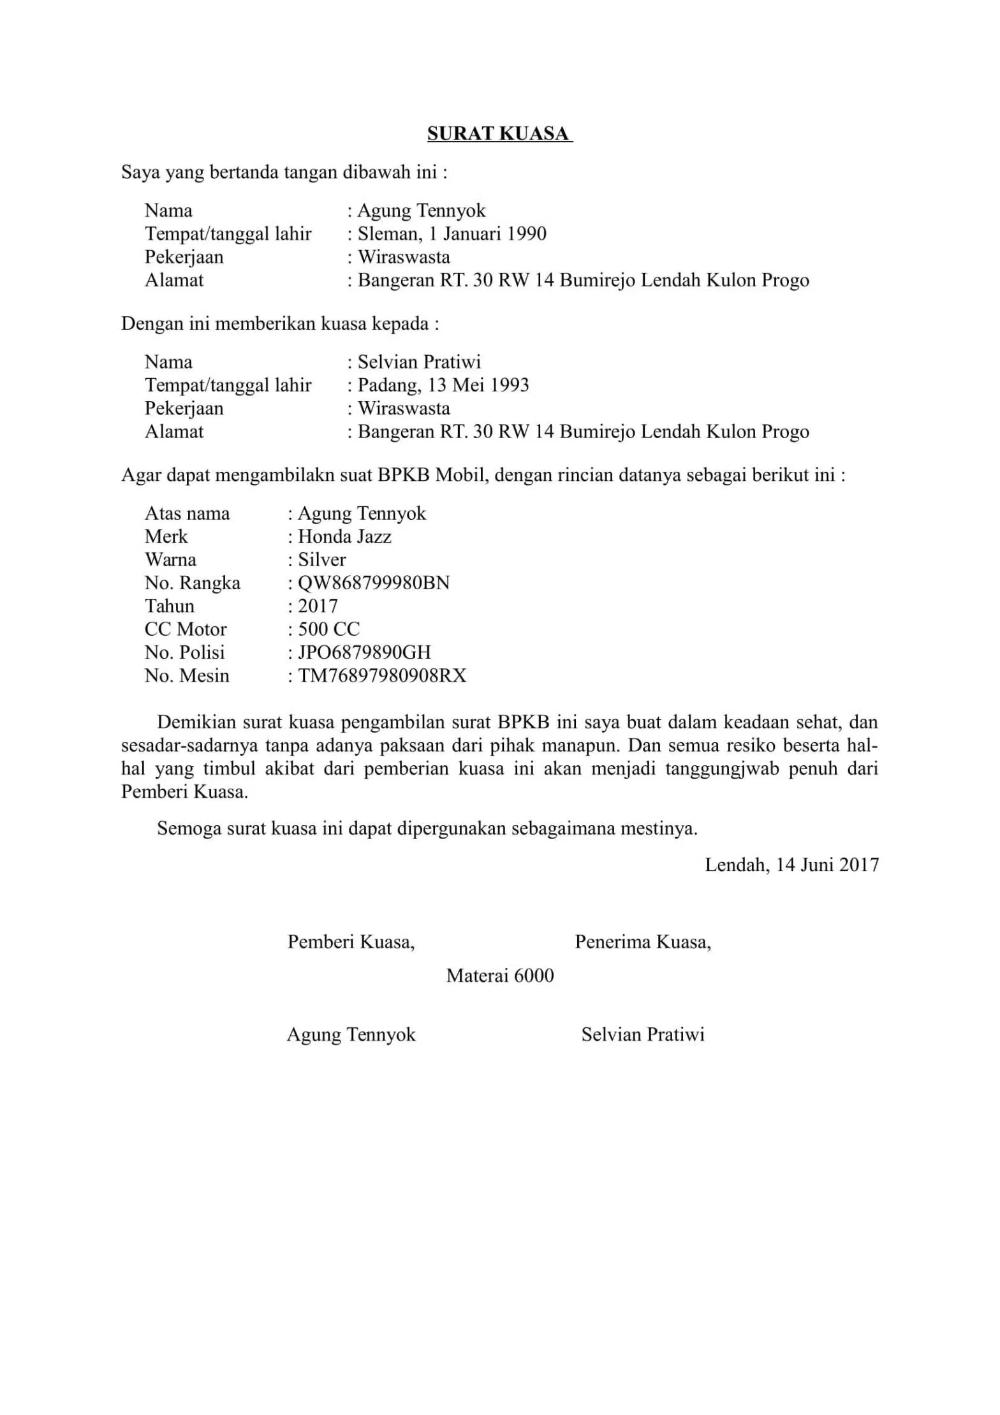 DOCX Surat Kuasa - Kominfo Ri